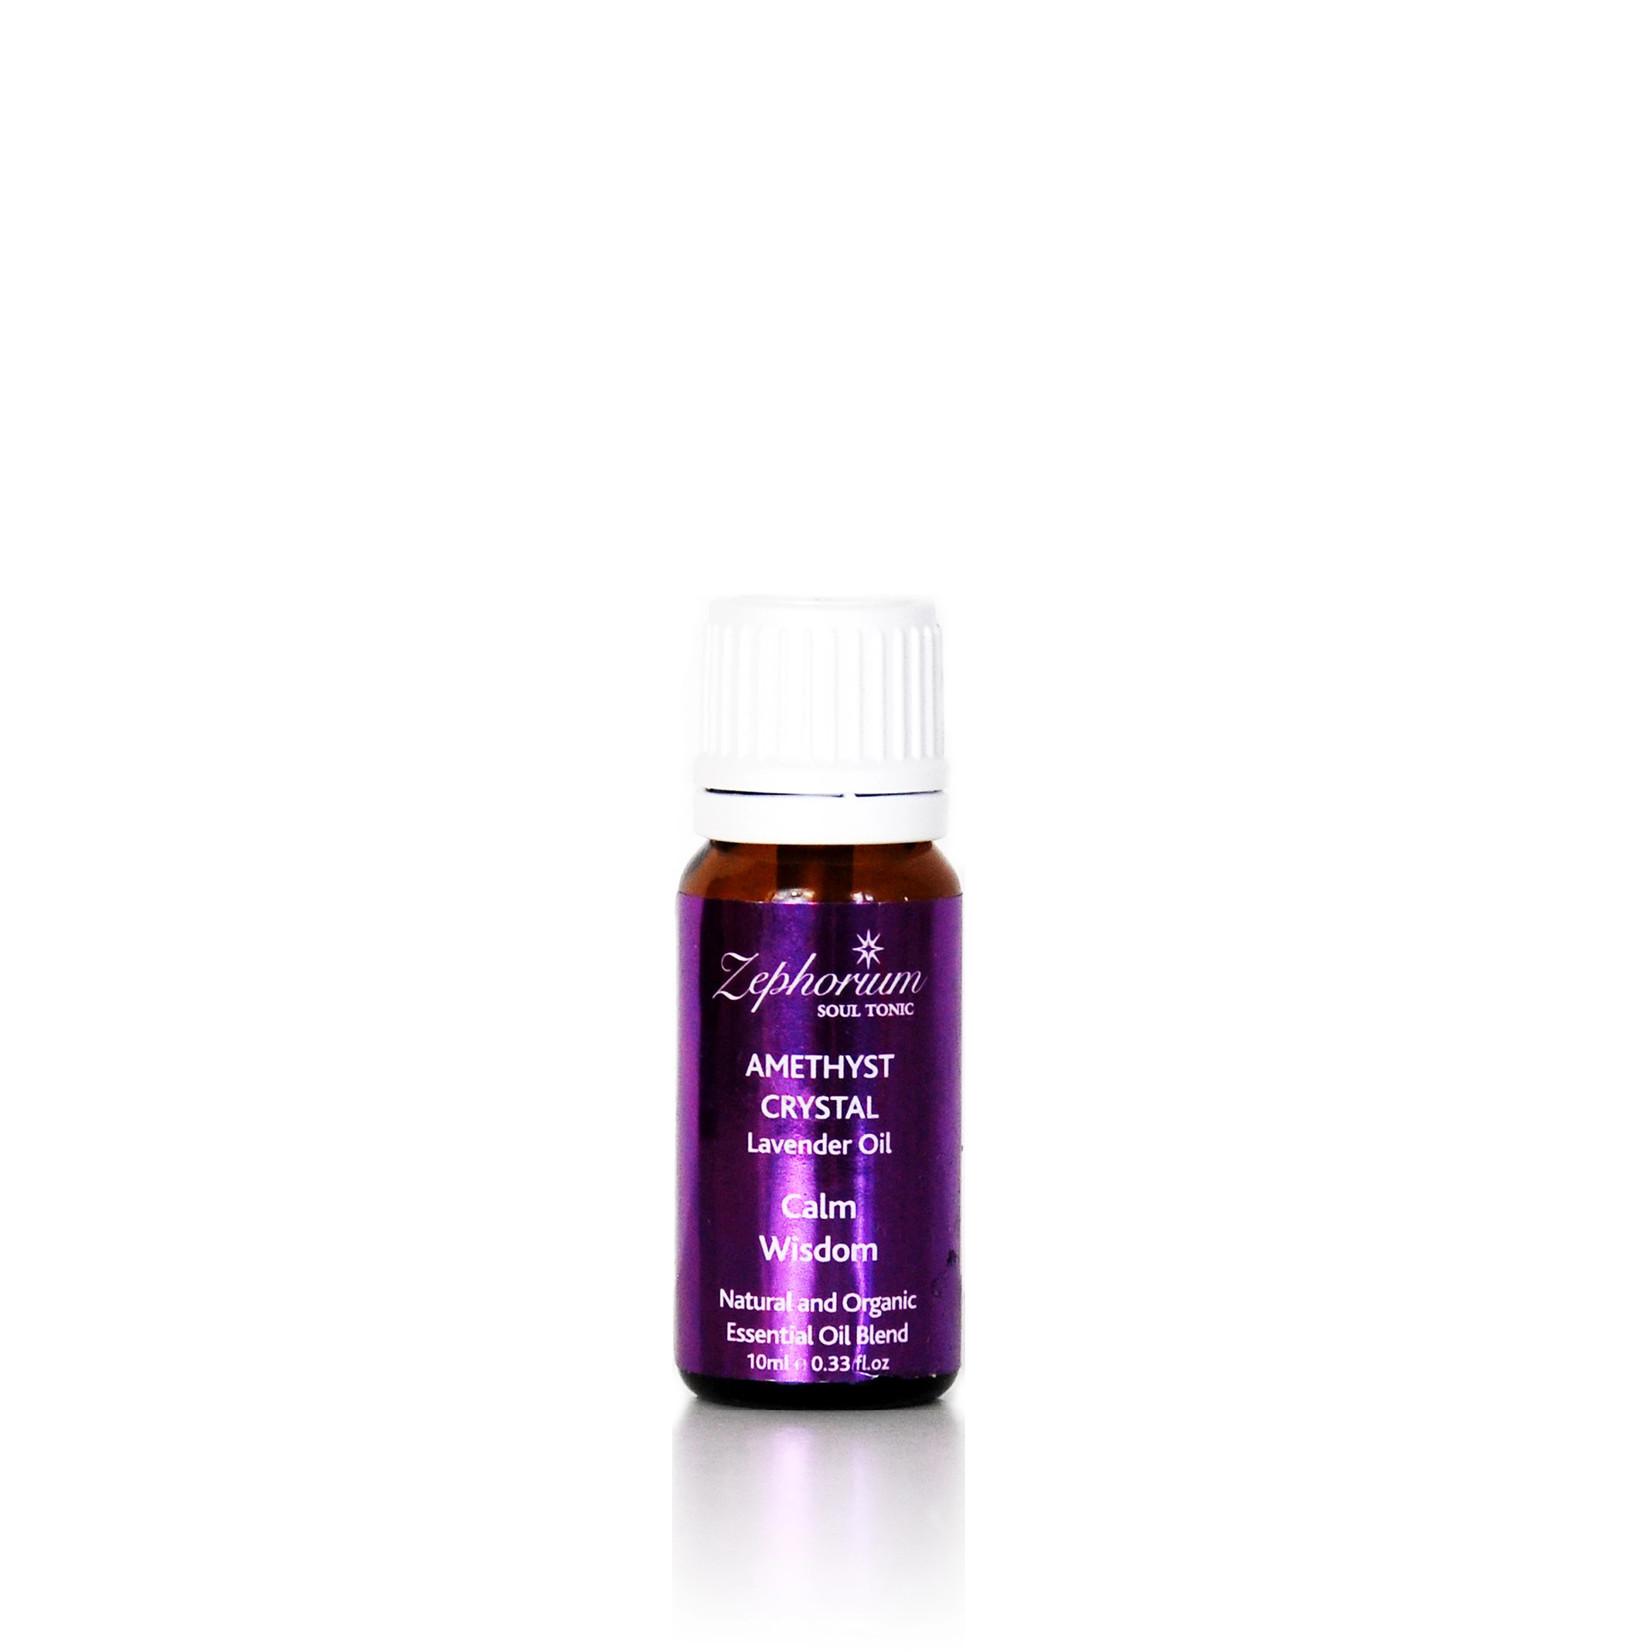 Zephorium Amethyst essential oils blend met kristallen - Zephorium